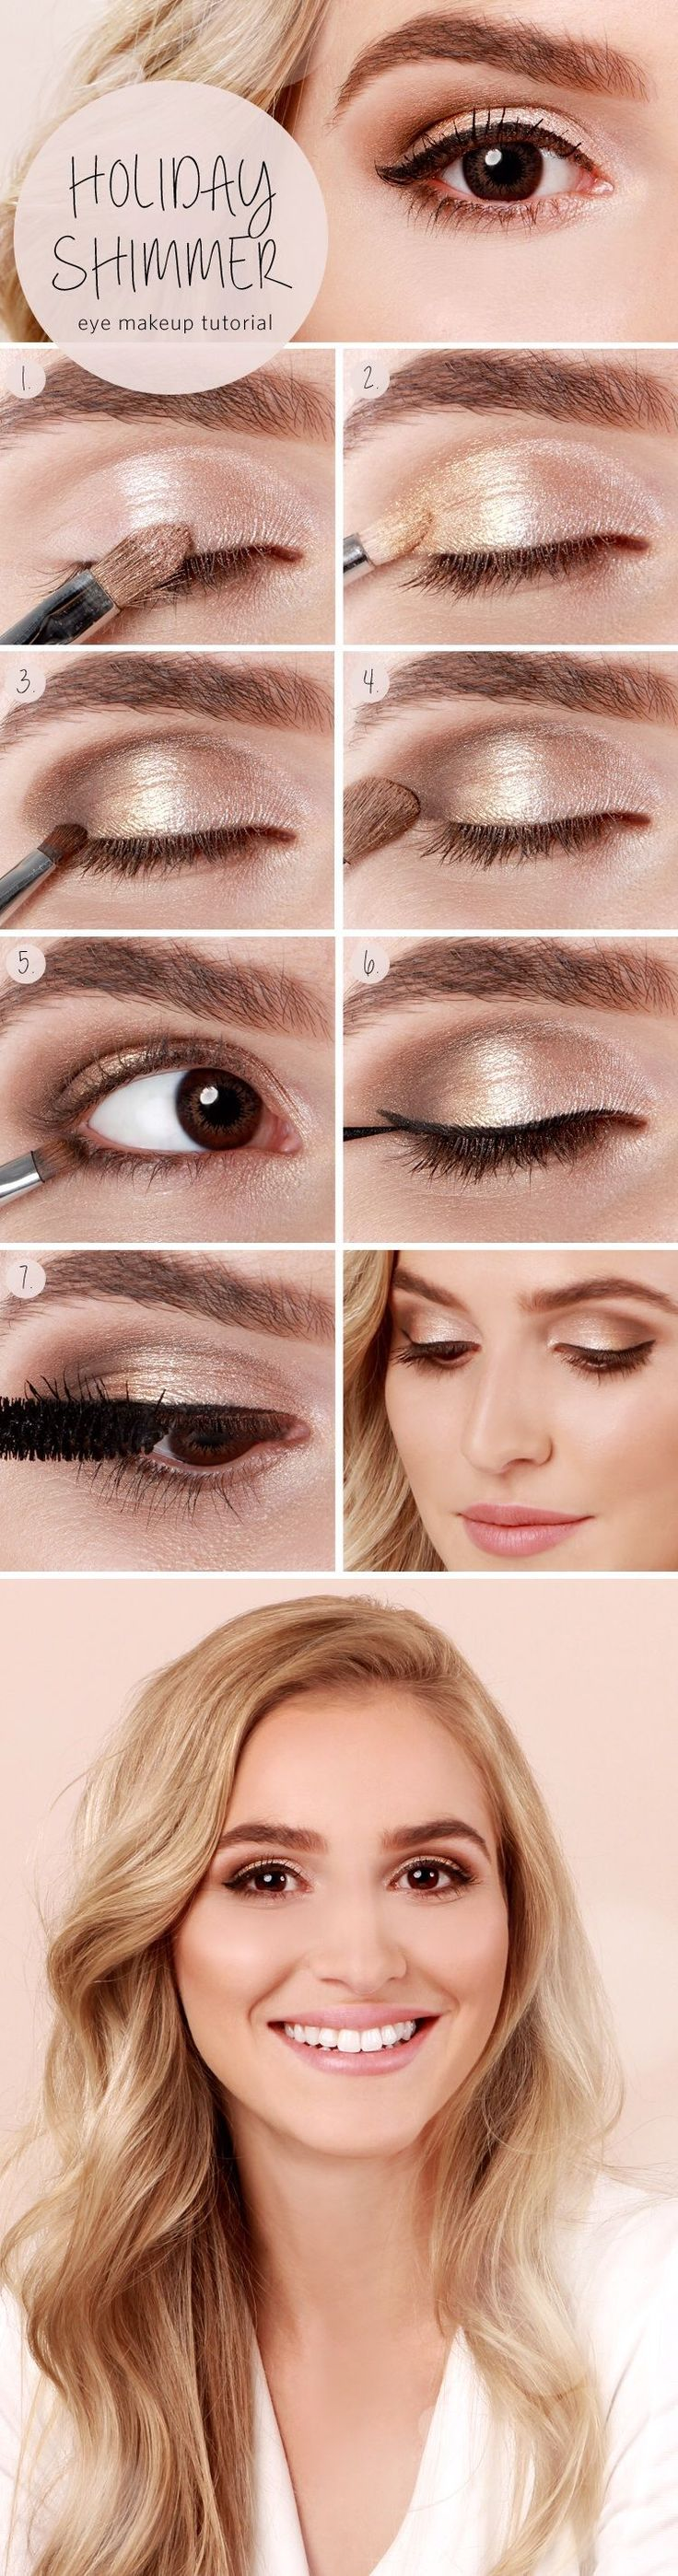 /dashby3 Gold Coast & Hazelnut Mineral Eyeshadow with Bronze Eyes /dashby3 Gold Coast & Hazelnut Mineral Eyeshadow with Bronze Eyes ...